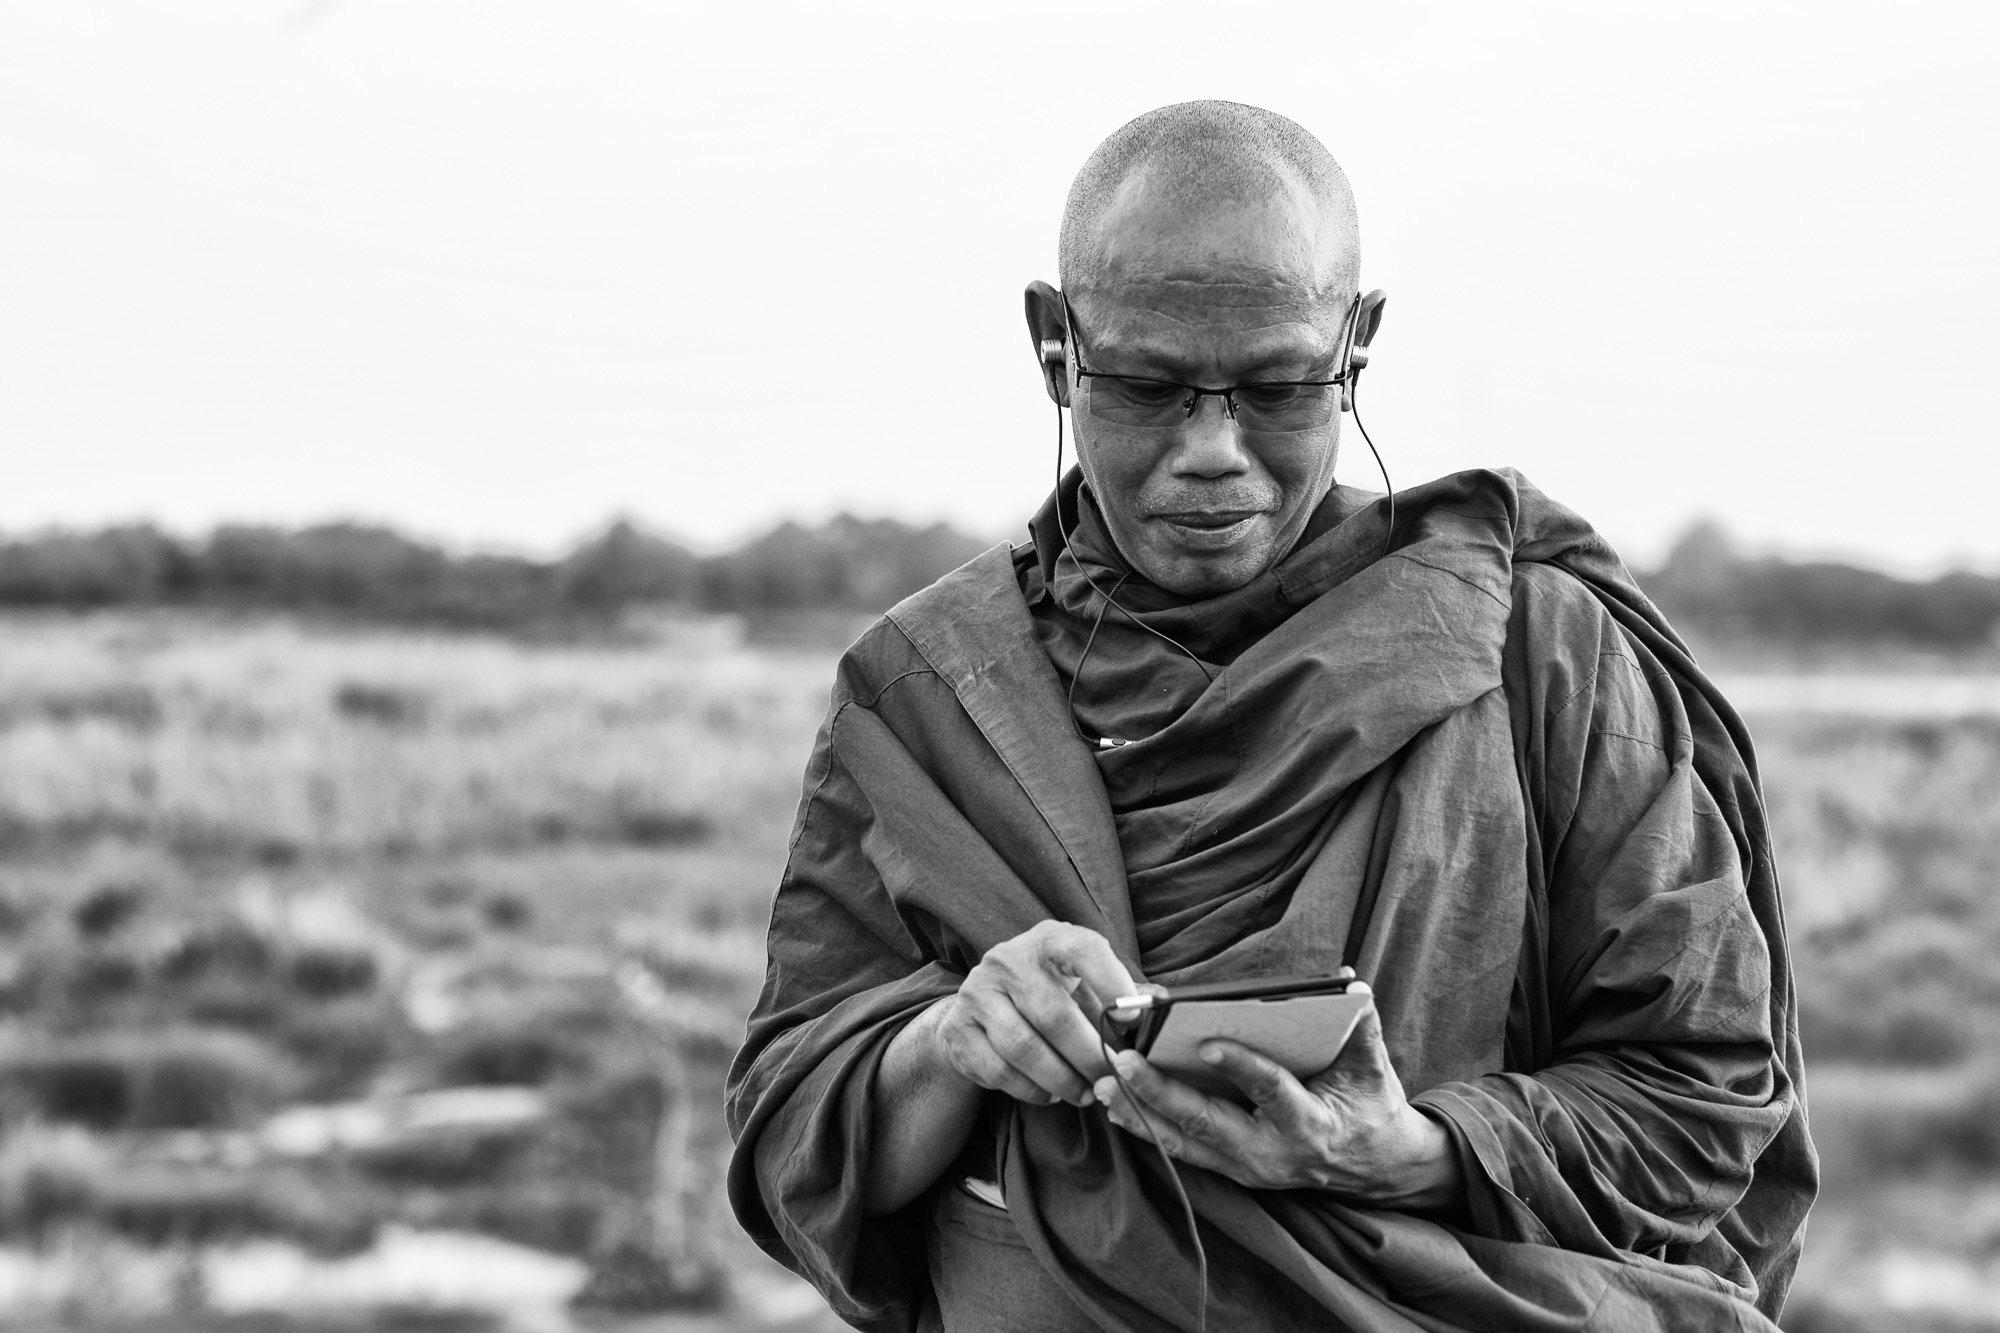 buddhist monk VIENTIANE Laos asia street photography photographer